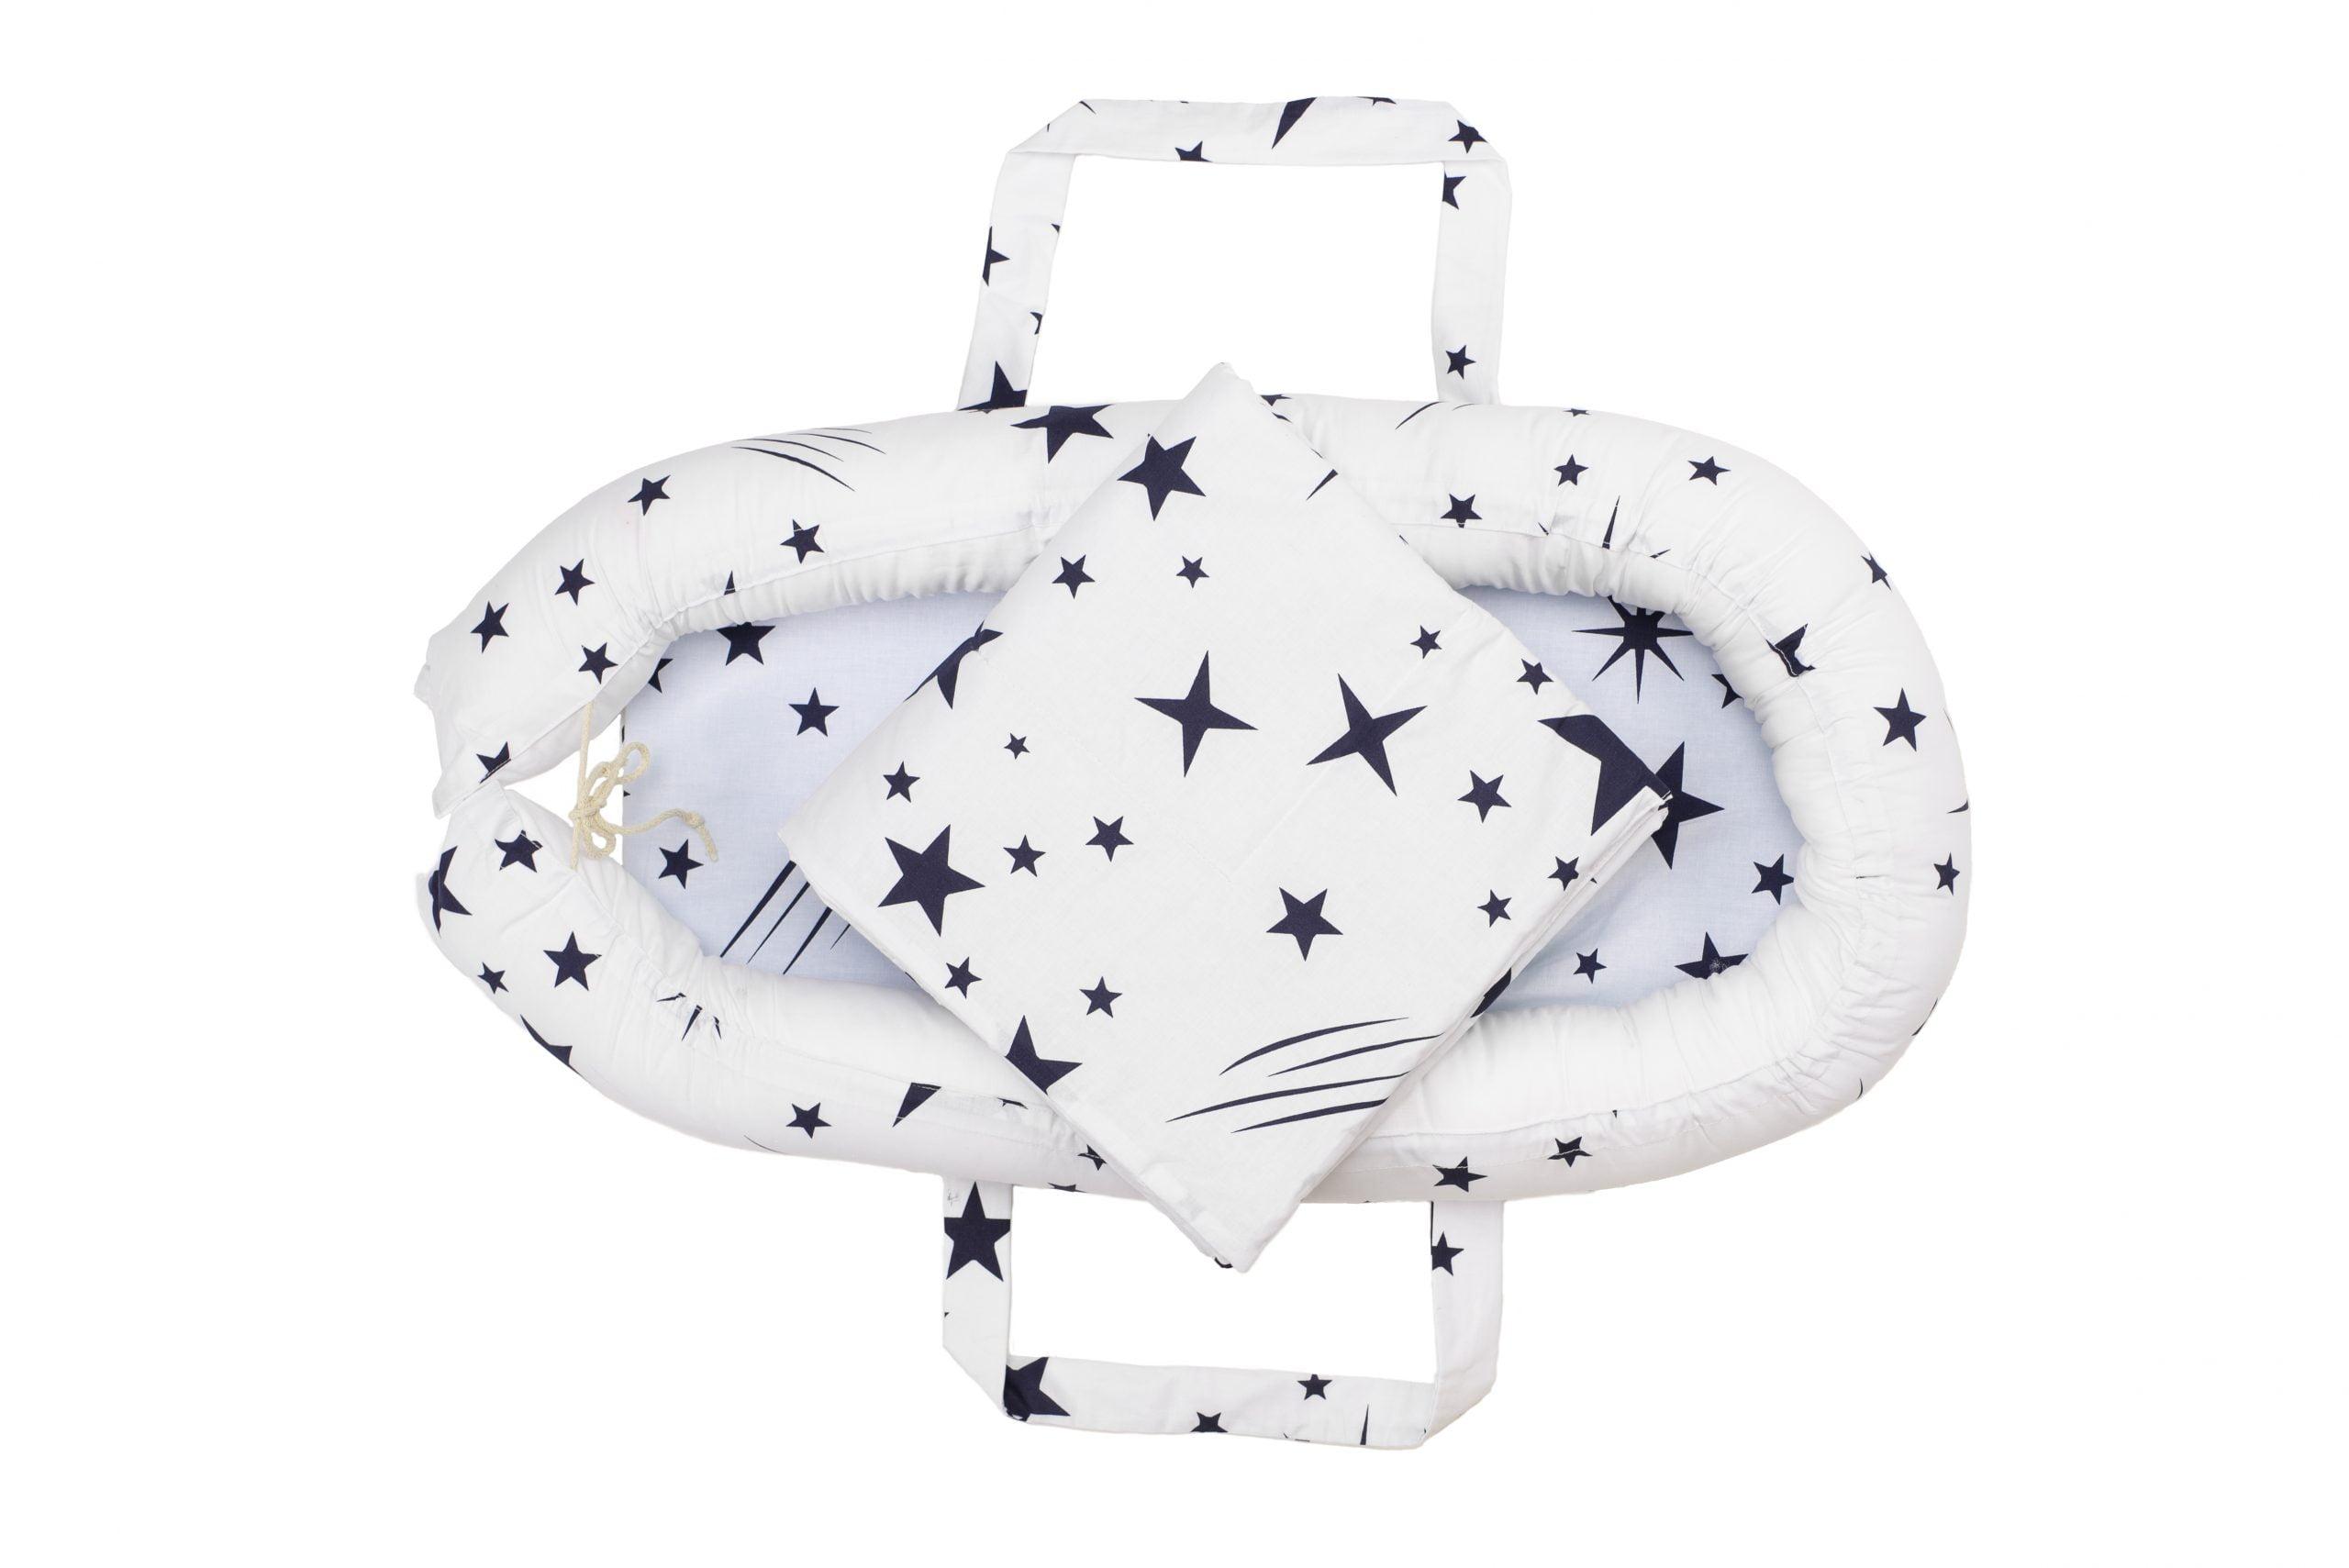 Baby Nest Somnart: Cosulet bebelusi + Salteluta 42x84x2 cm + Paturica 70x70 cm model Stelute imagine 2021 somnart.ro